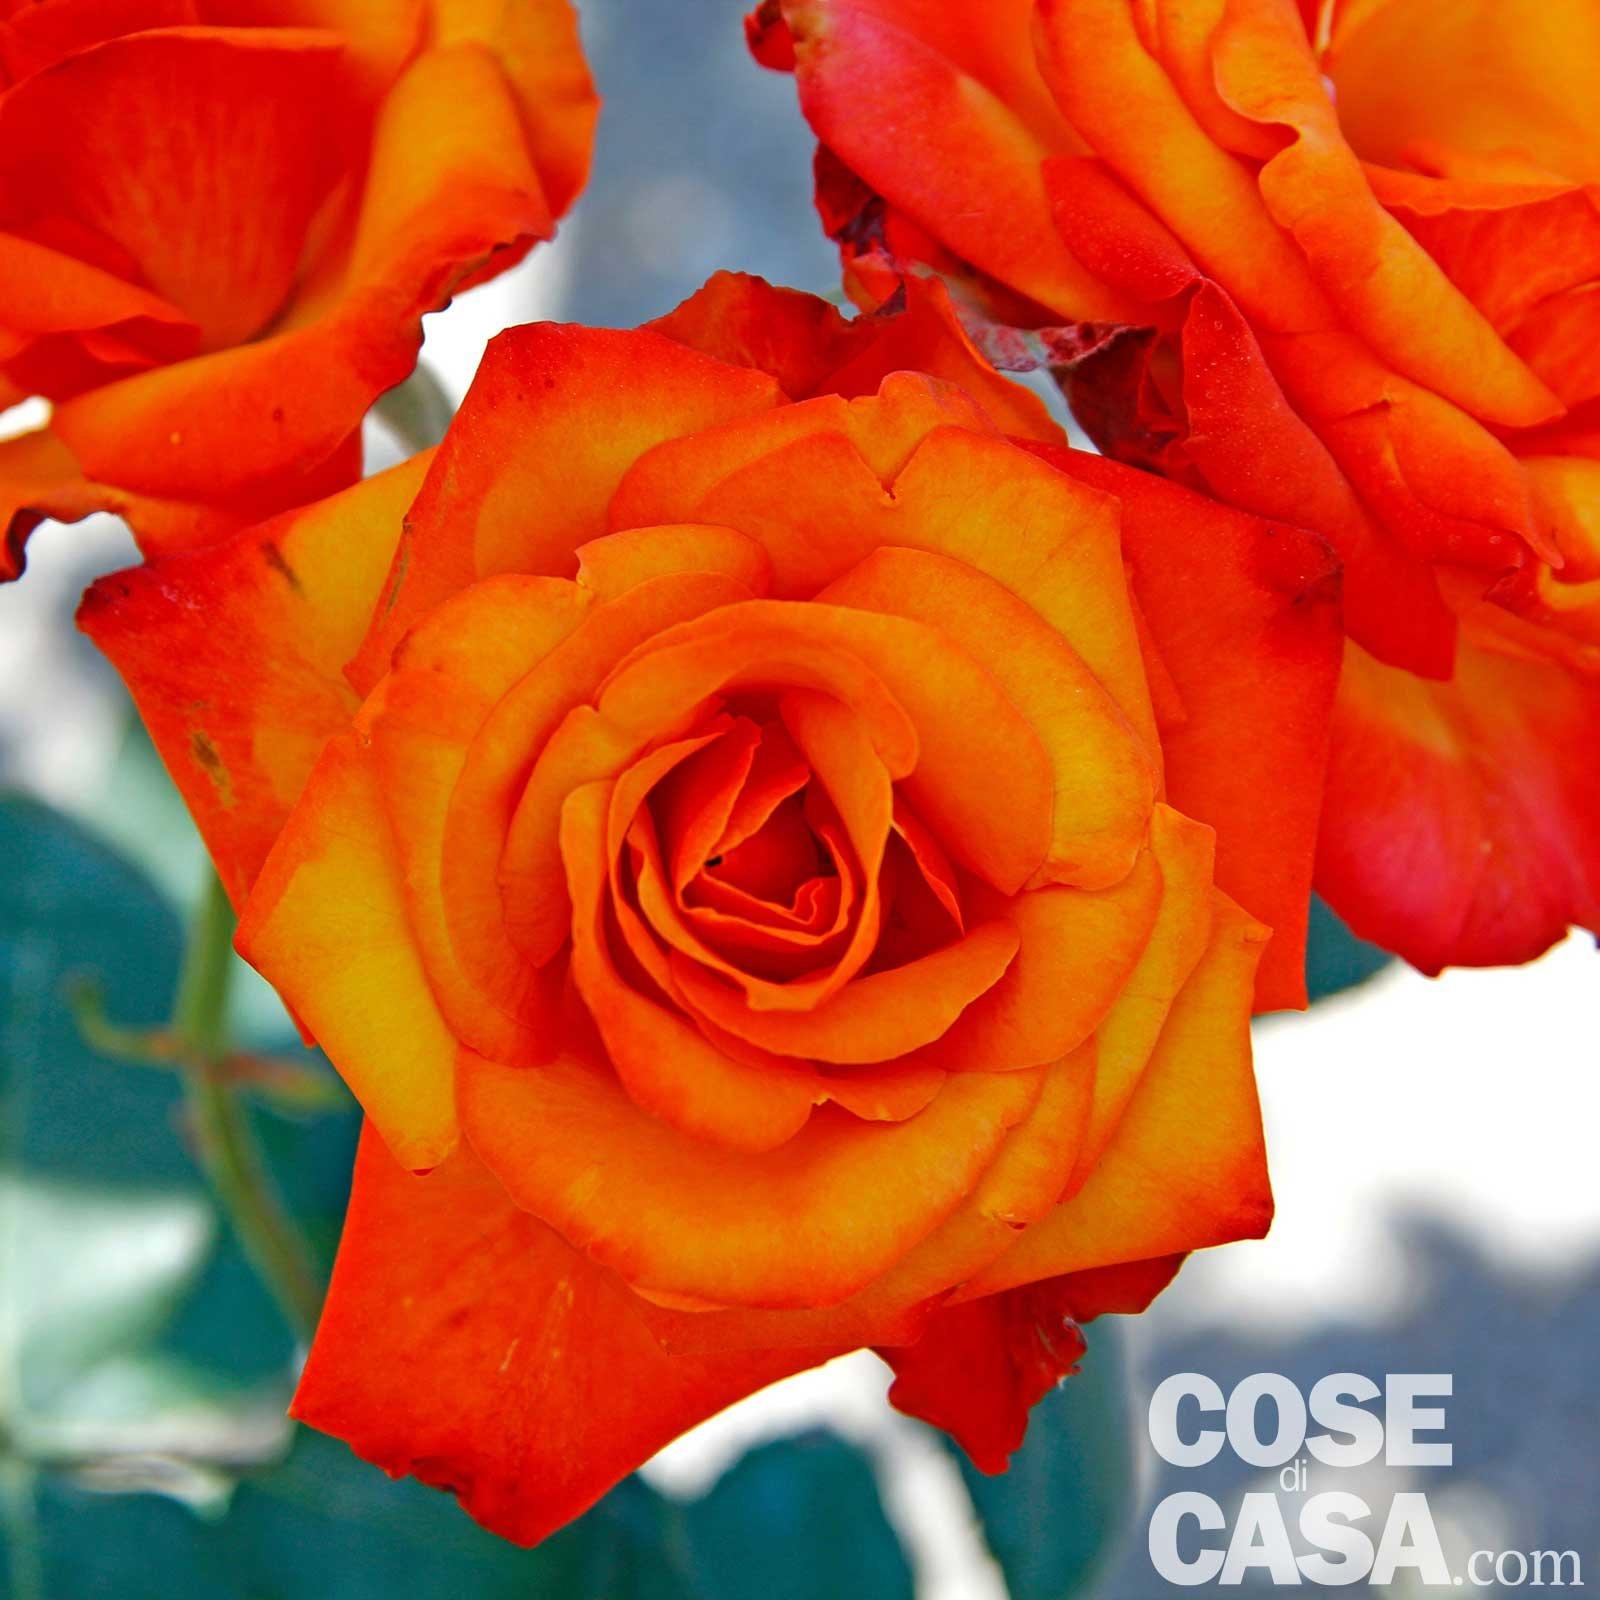 Rose Da Taglio Rifiorenti nove rose bellissime: elenco specie e descrizione - cose di casa